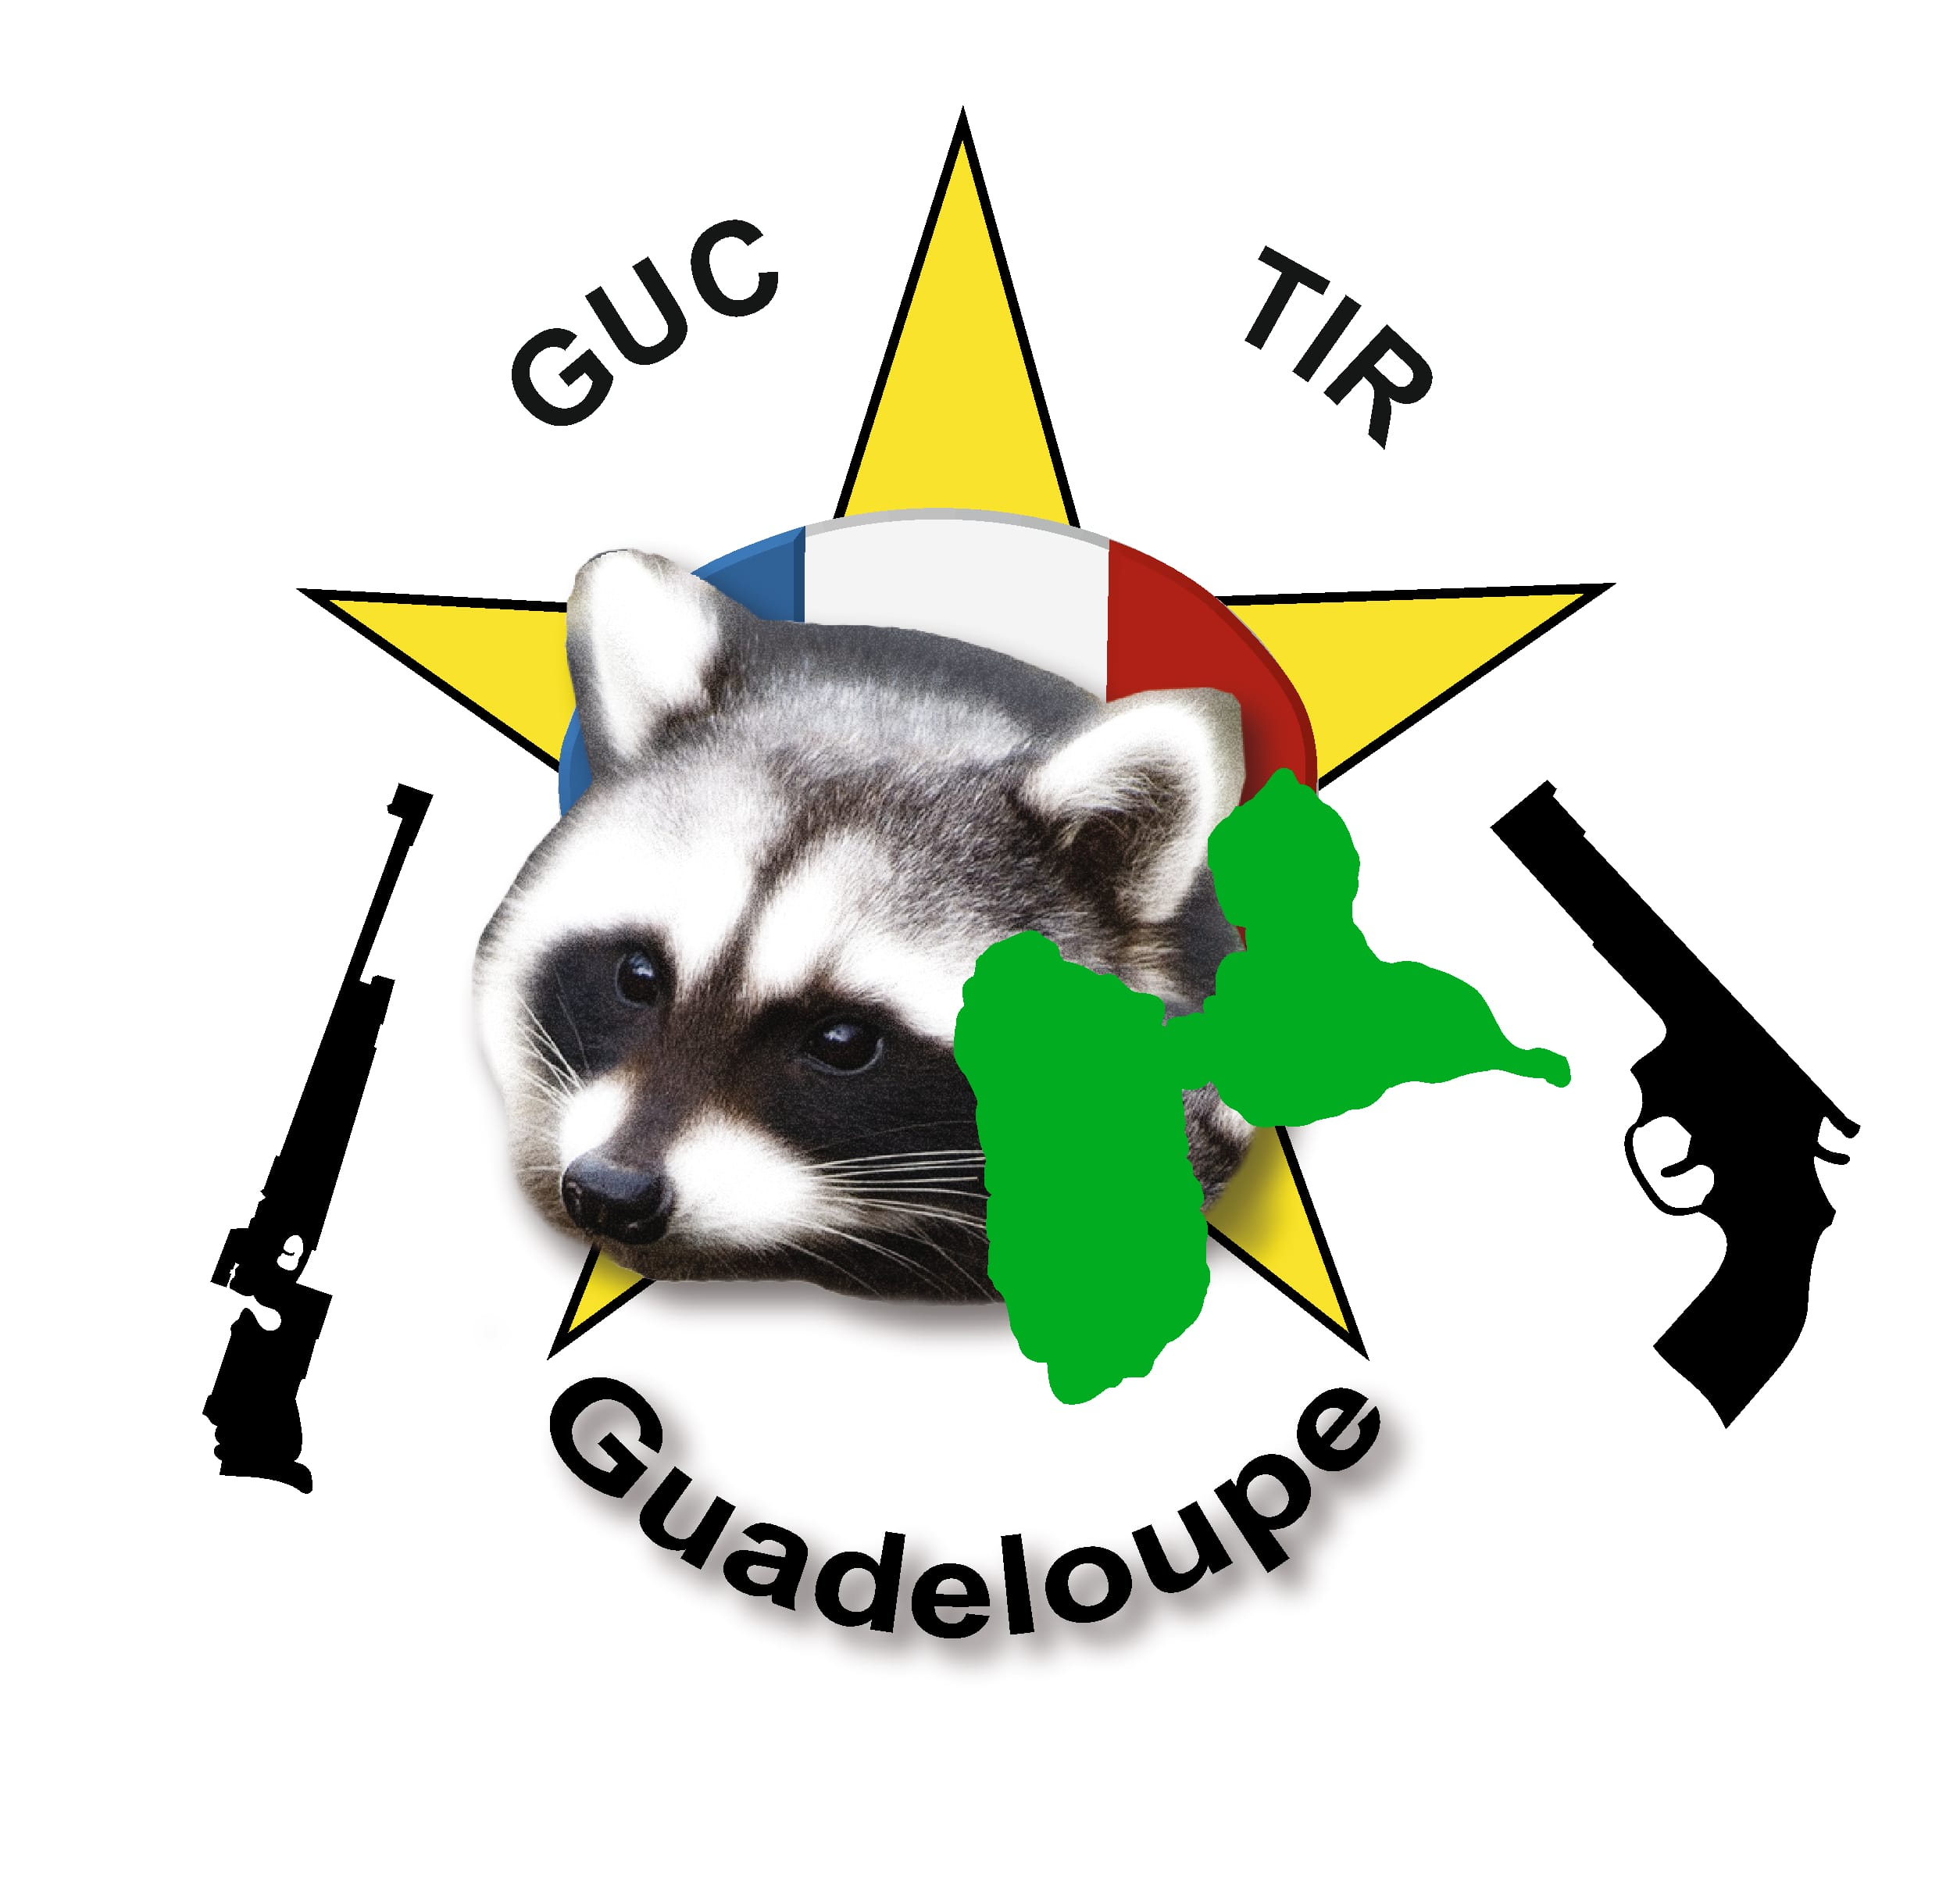 Guadeloupe Université Club Section Tir - GUC Tir